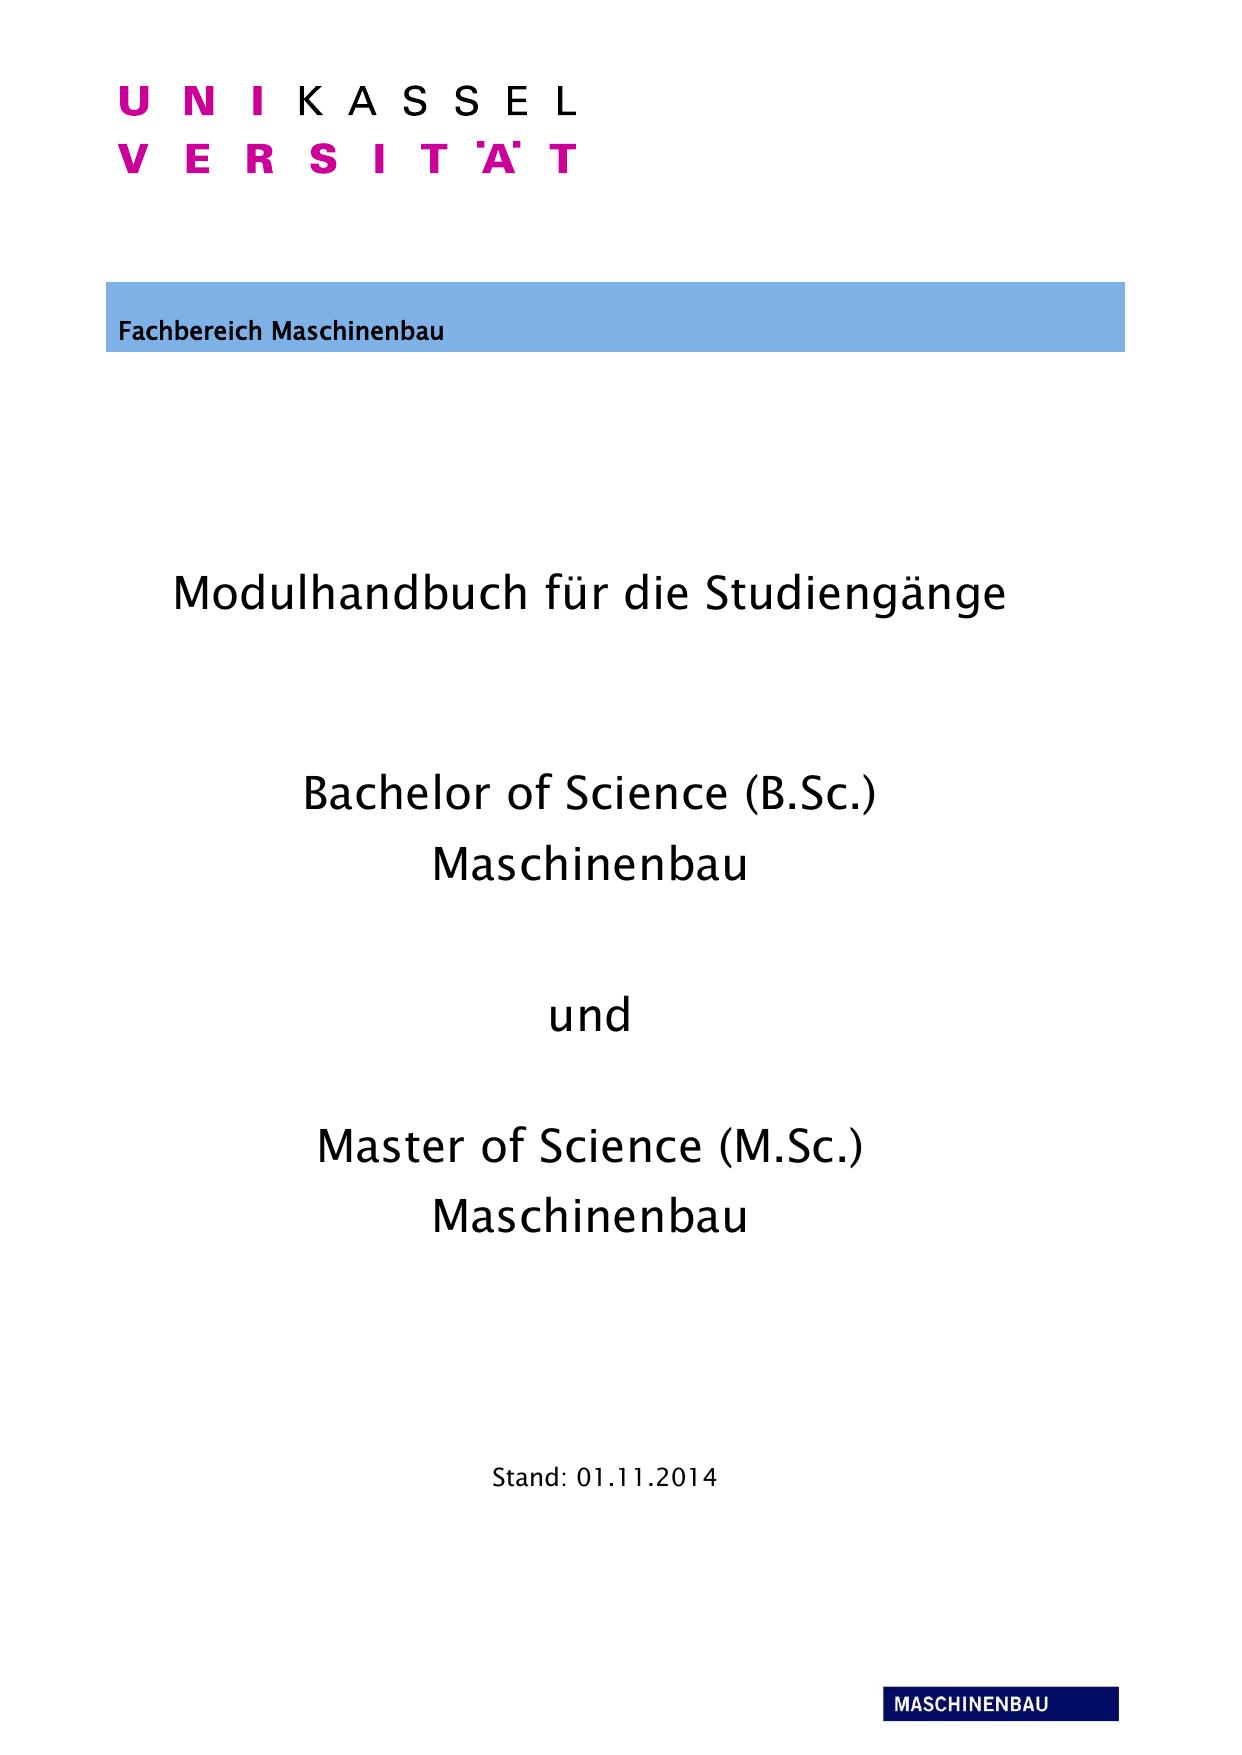 Universität Kassel, Fachbereich Maschinenbau | manualzz.com